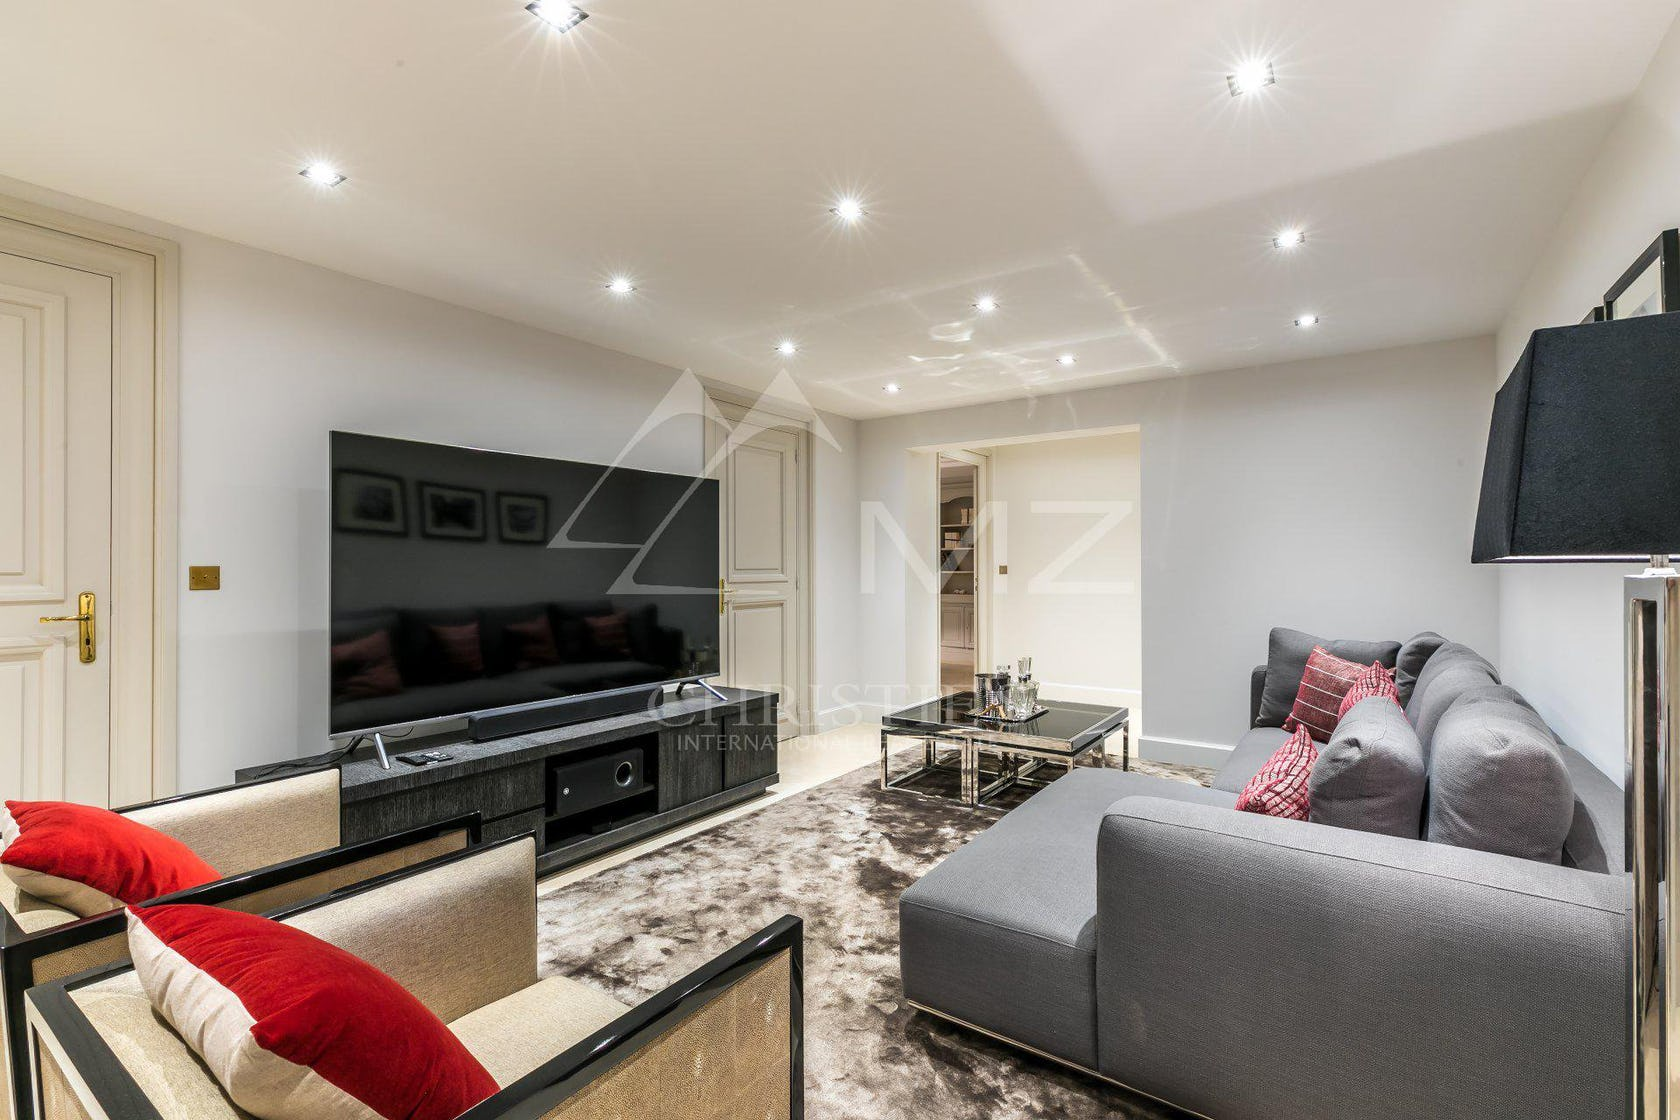 living room room indoors couch furniture interior design flooring